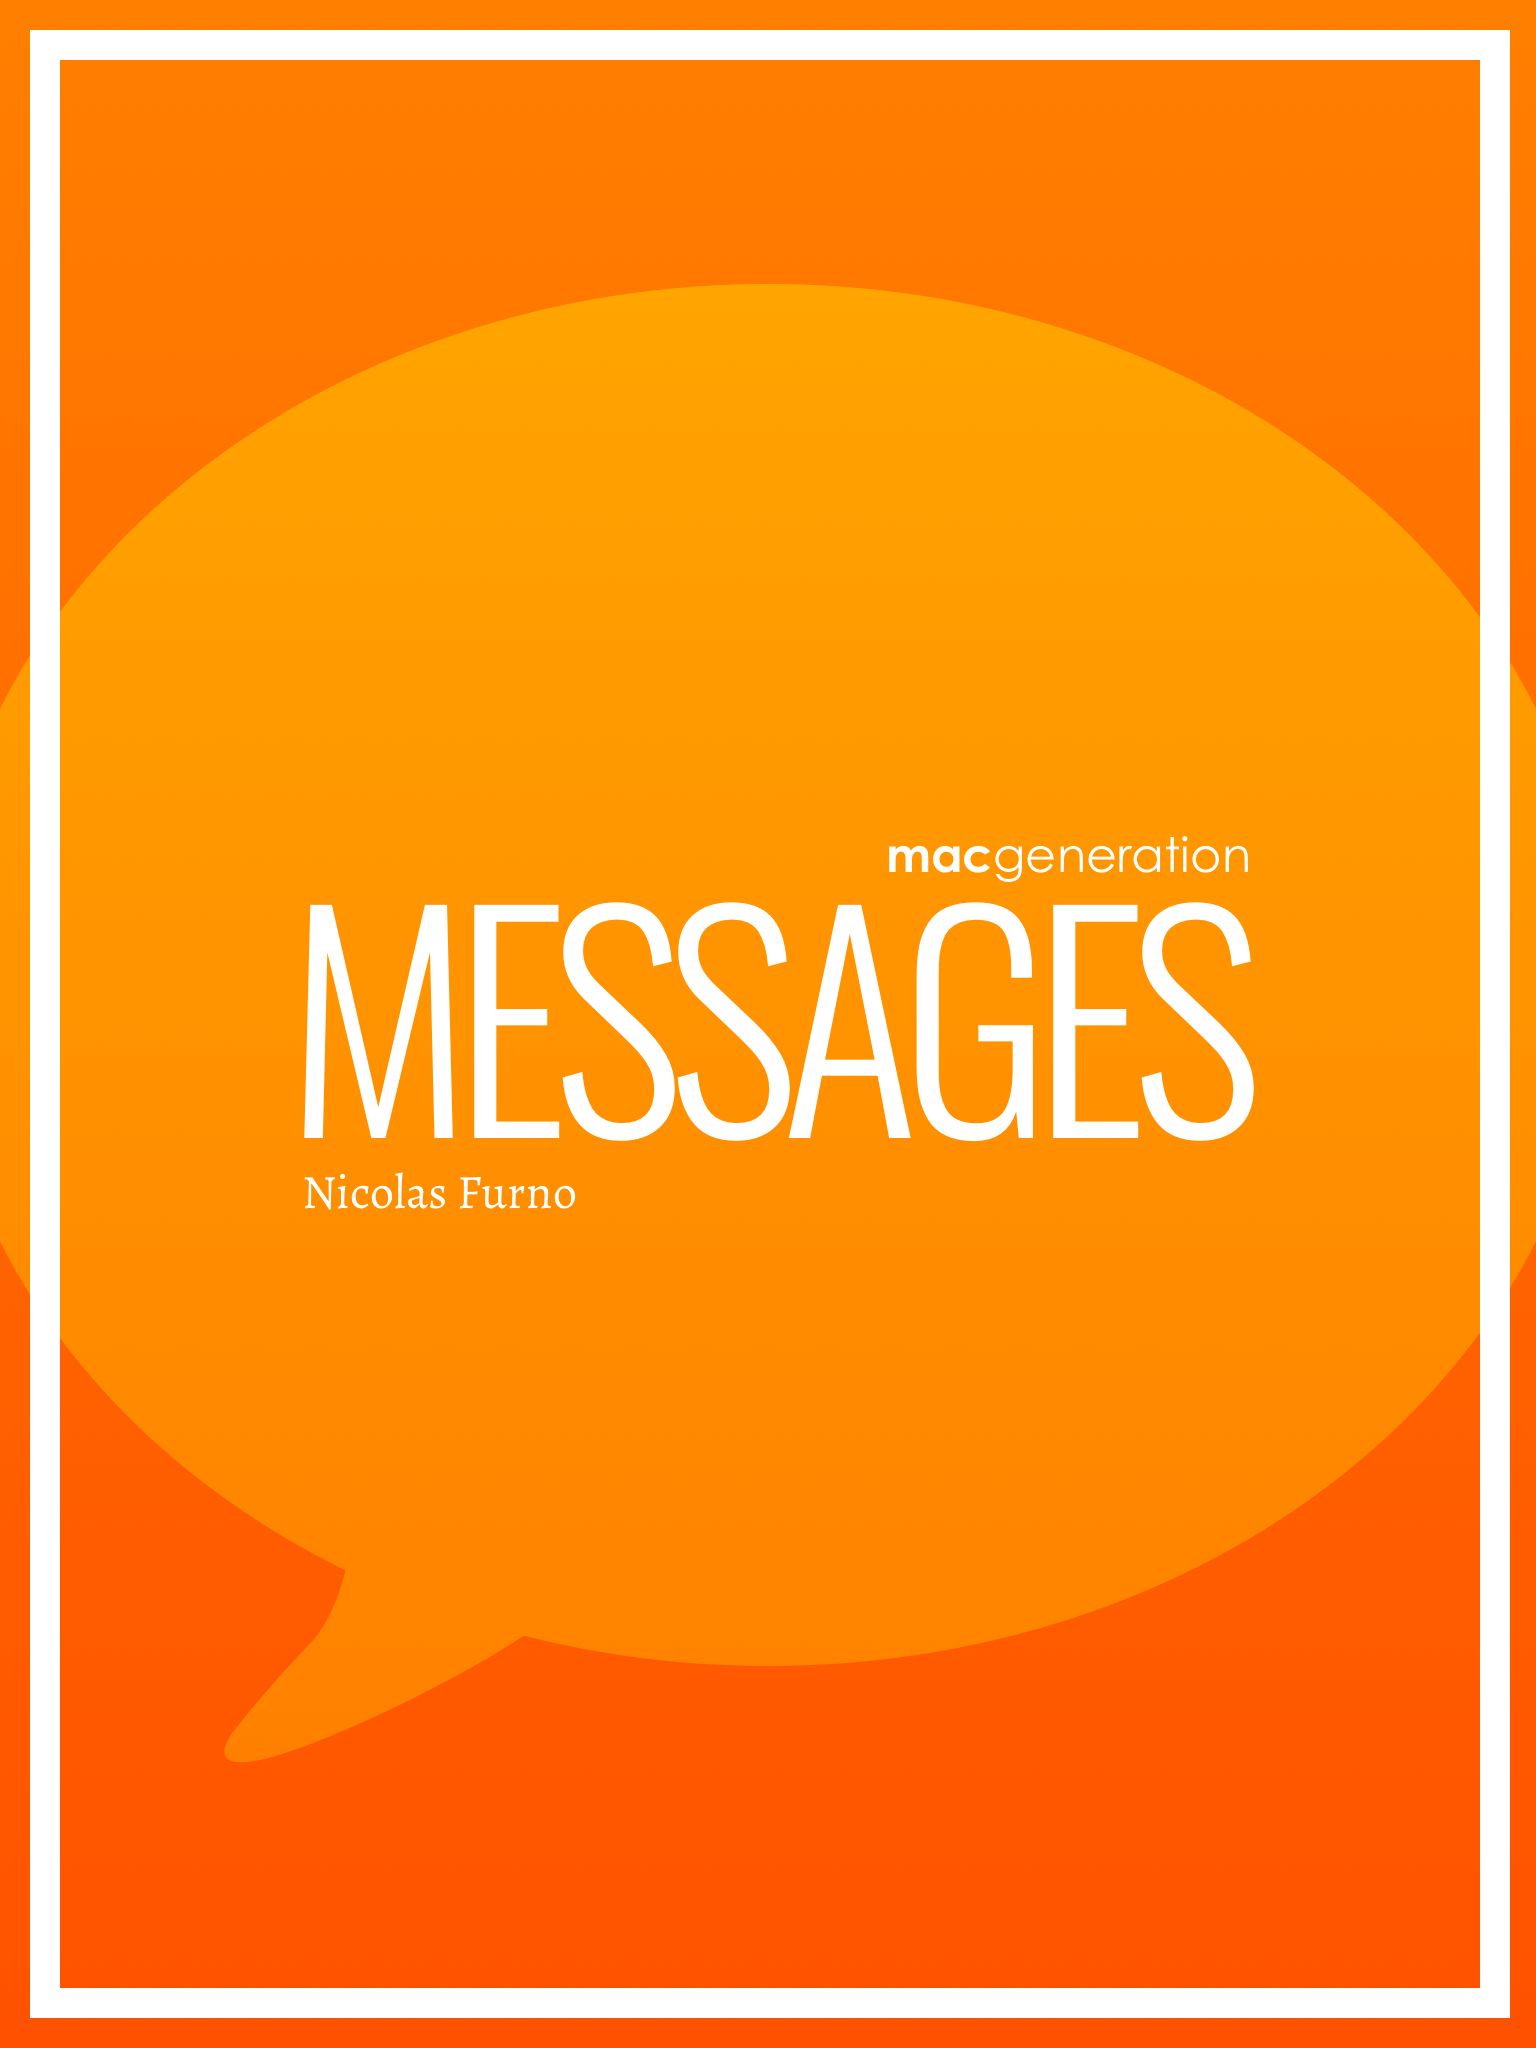 livres/savoir-messages.jpg